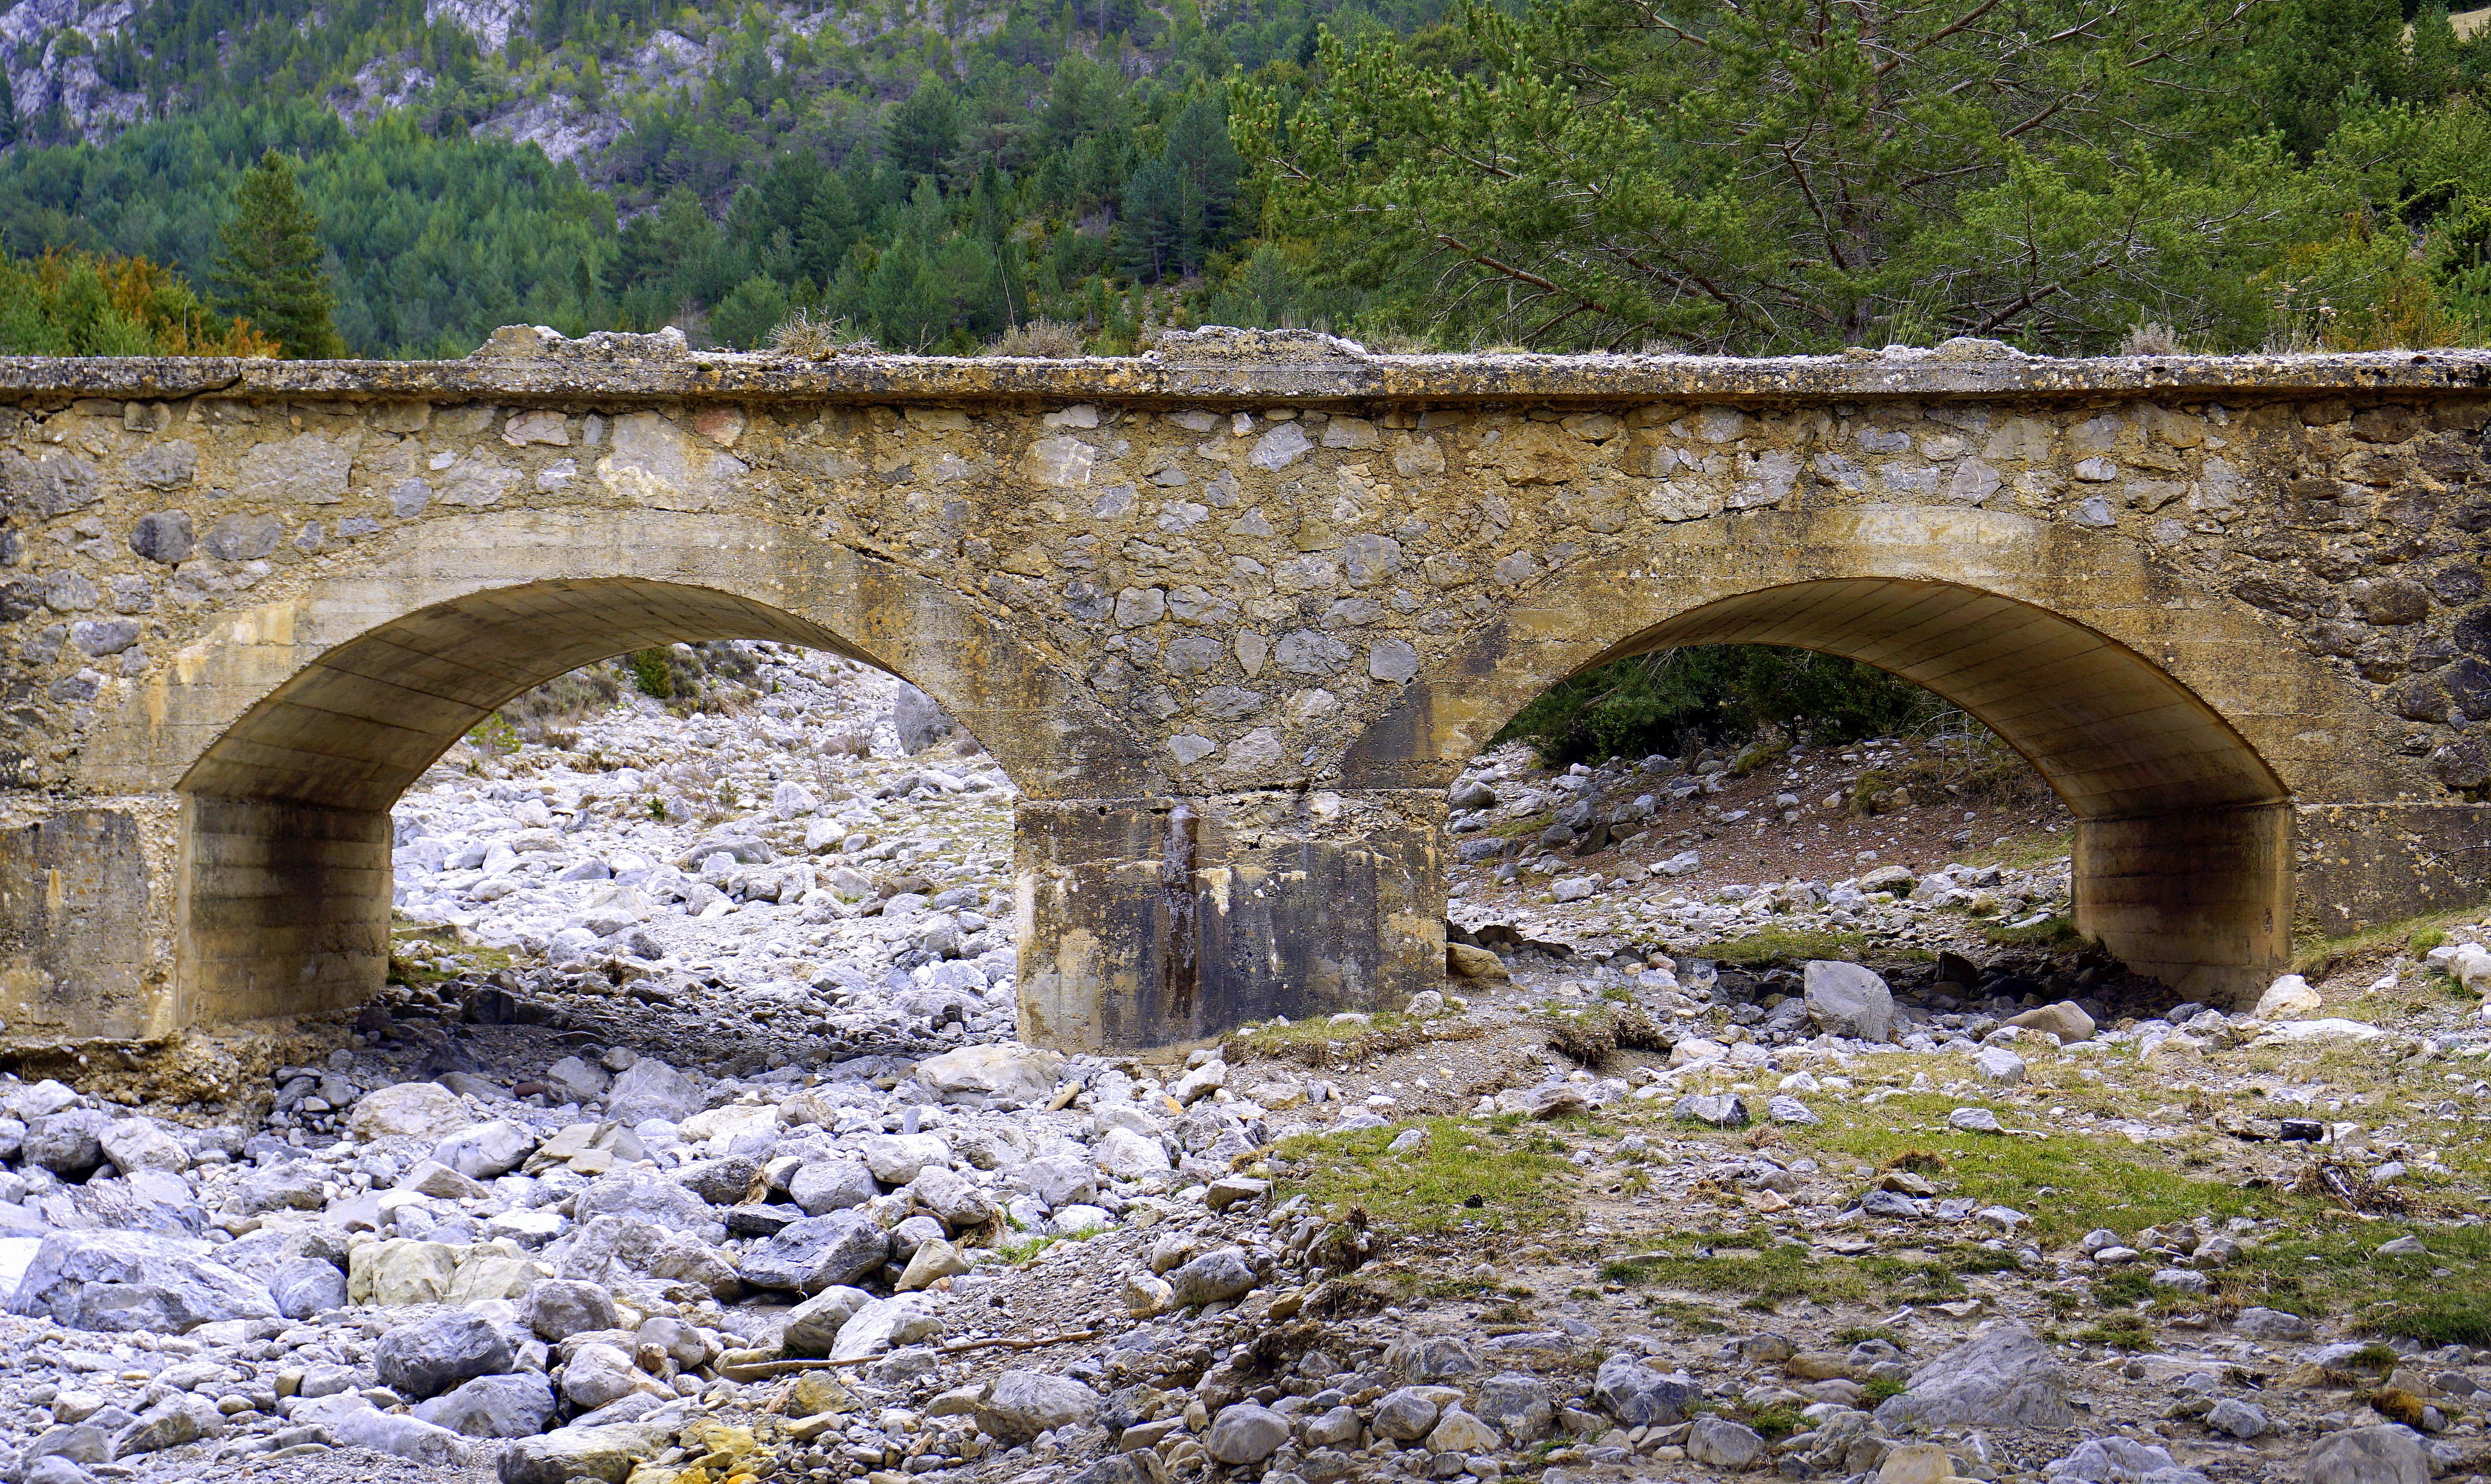 Free Images River Bed Erosion Rocks Stones Ruins